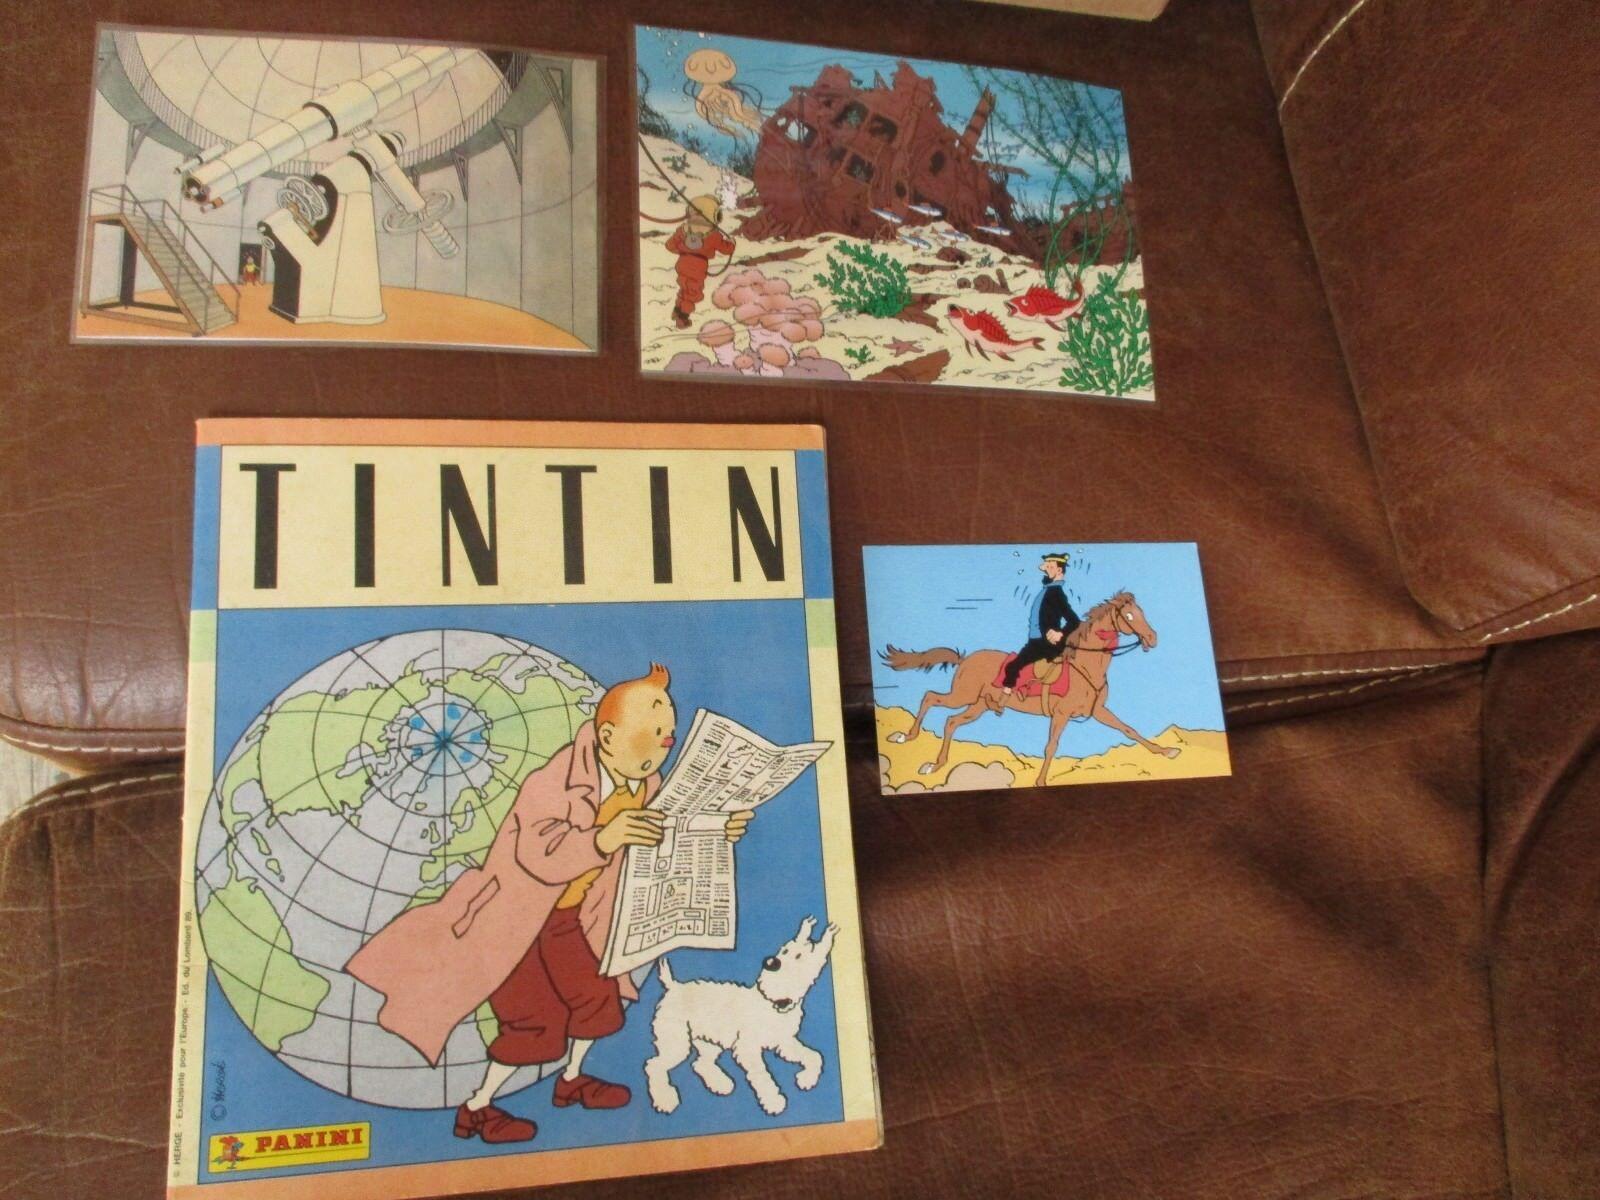 Tintin-Lot  Abum panini,Lombard,Hergé 1989+ photos plastifiées et carte Lombard